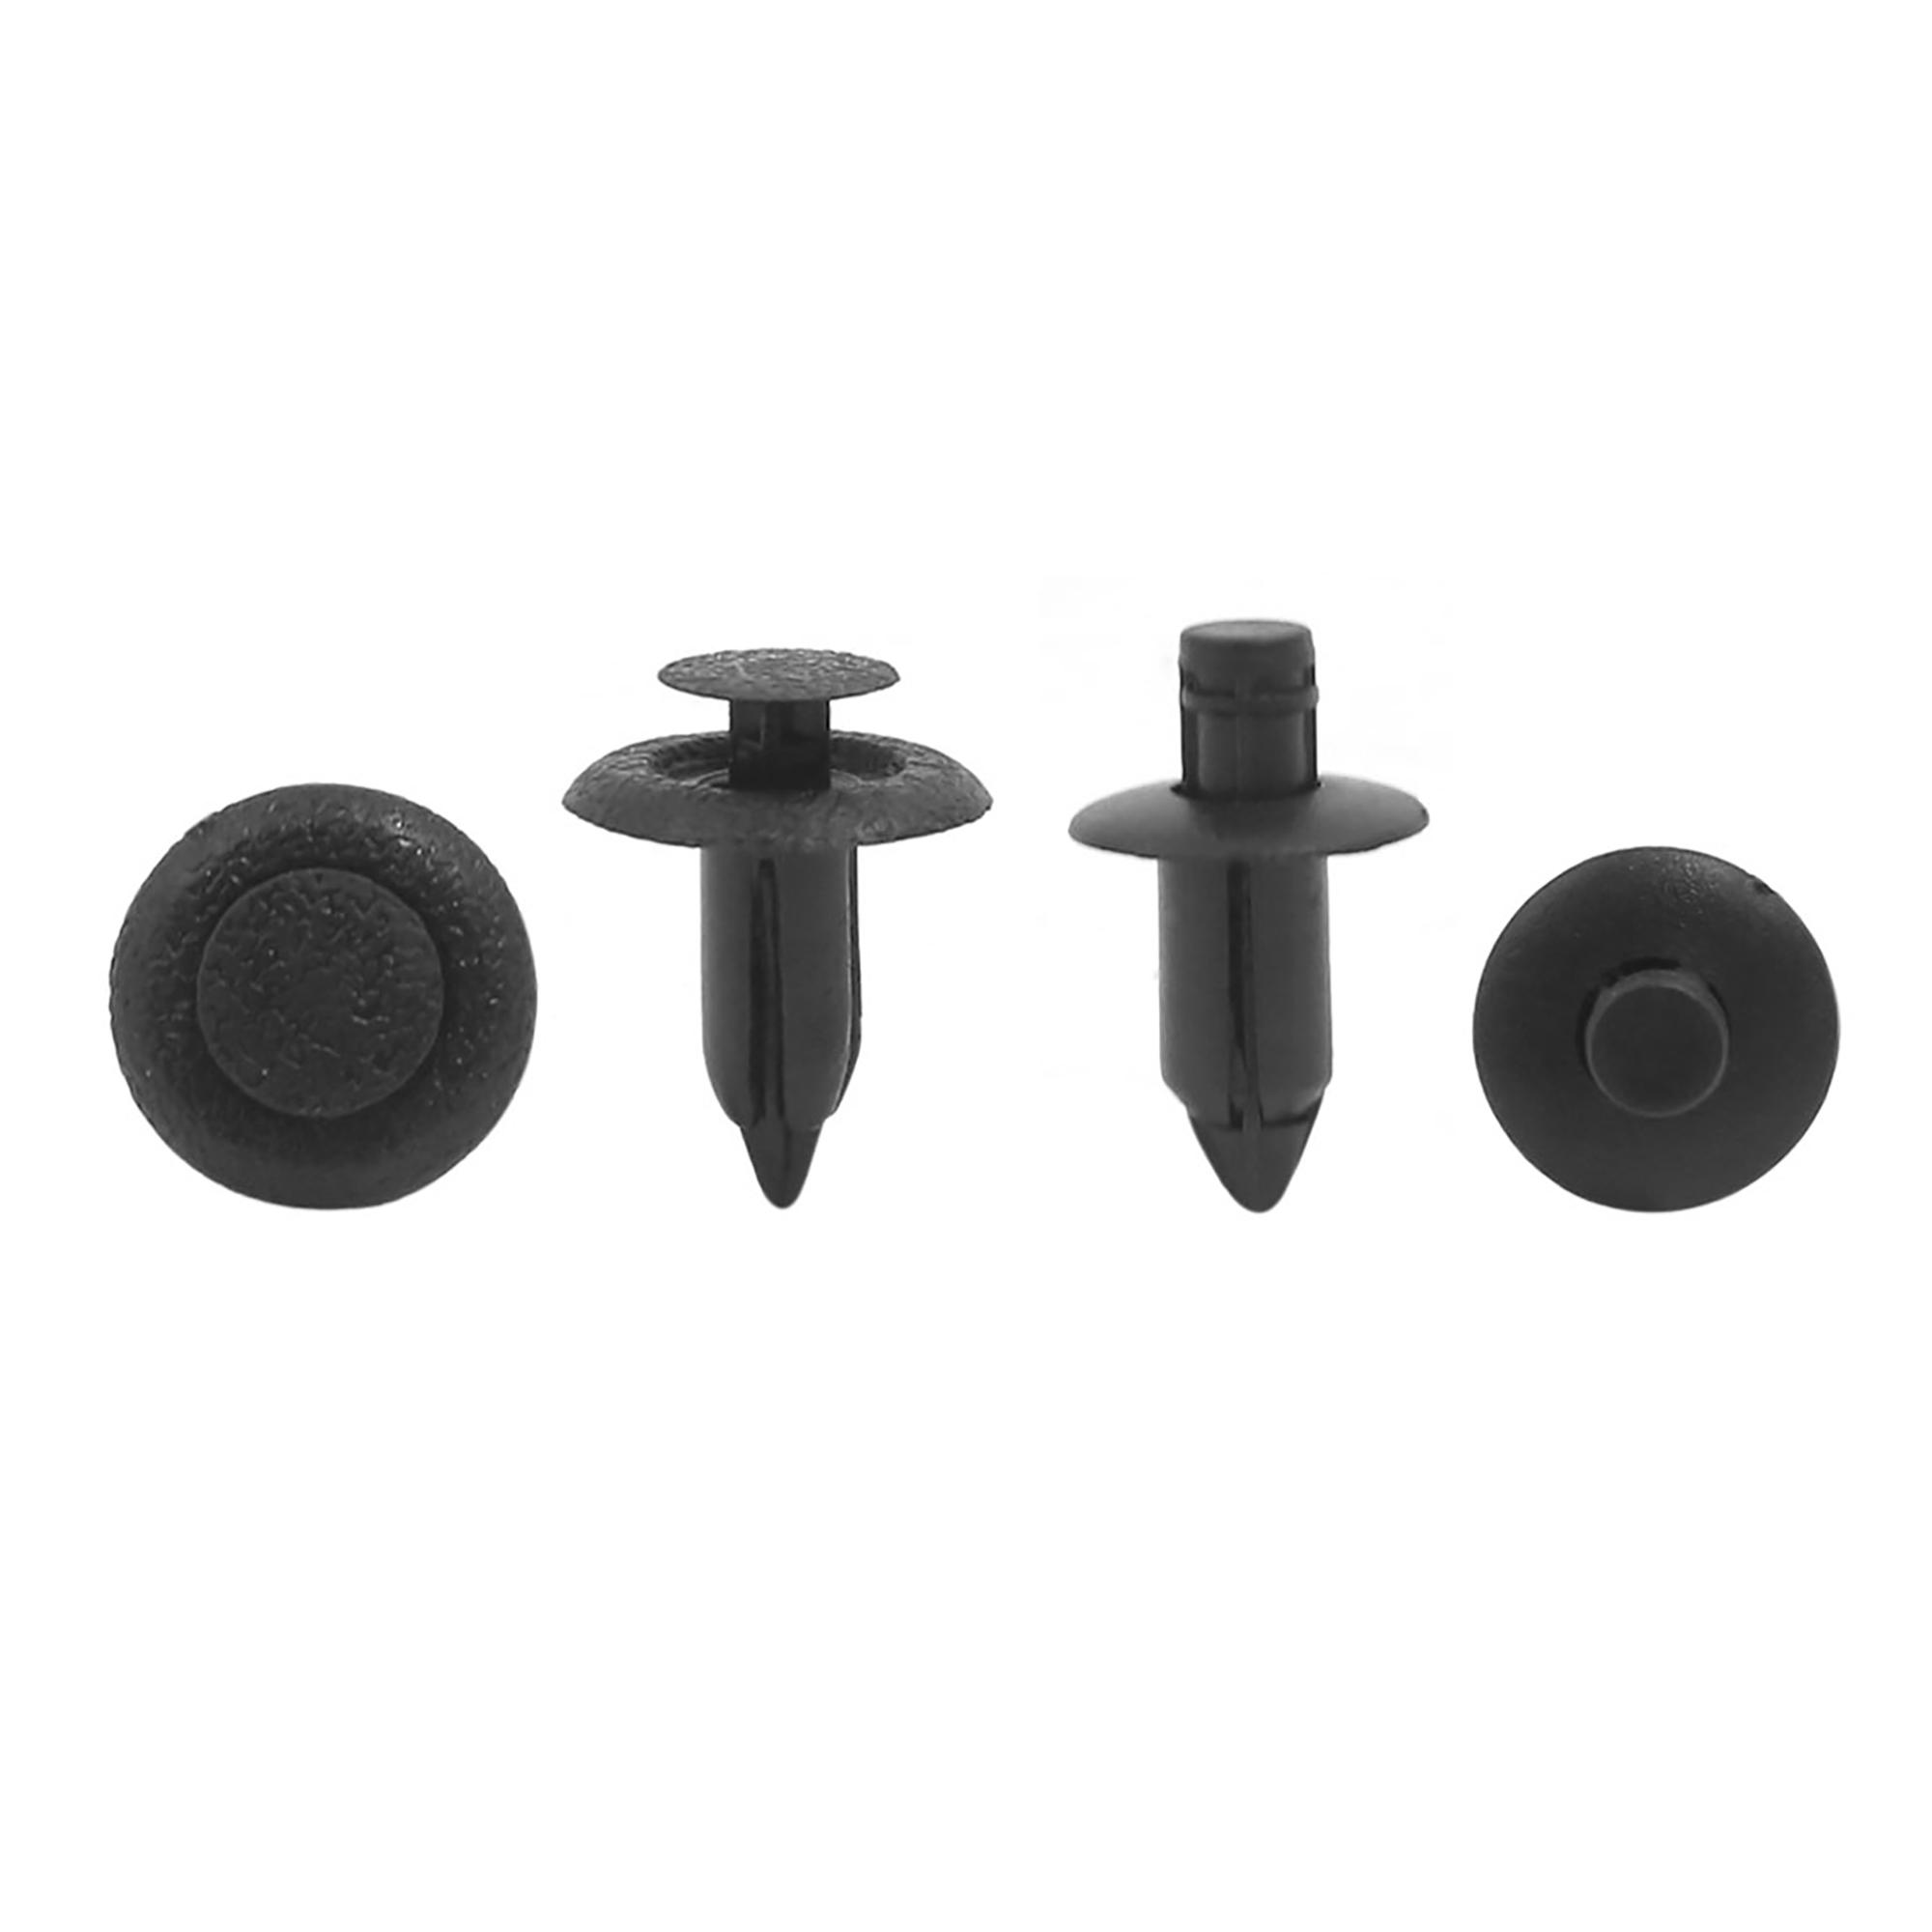 20 Pcs Black Plastic Defender Door Fastener Clips 6mm 7mm Hole Rivets for Suzuki